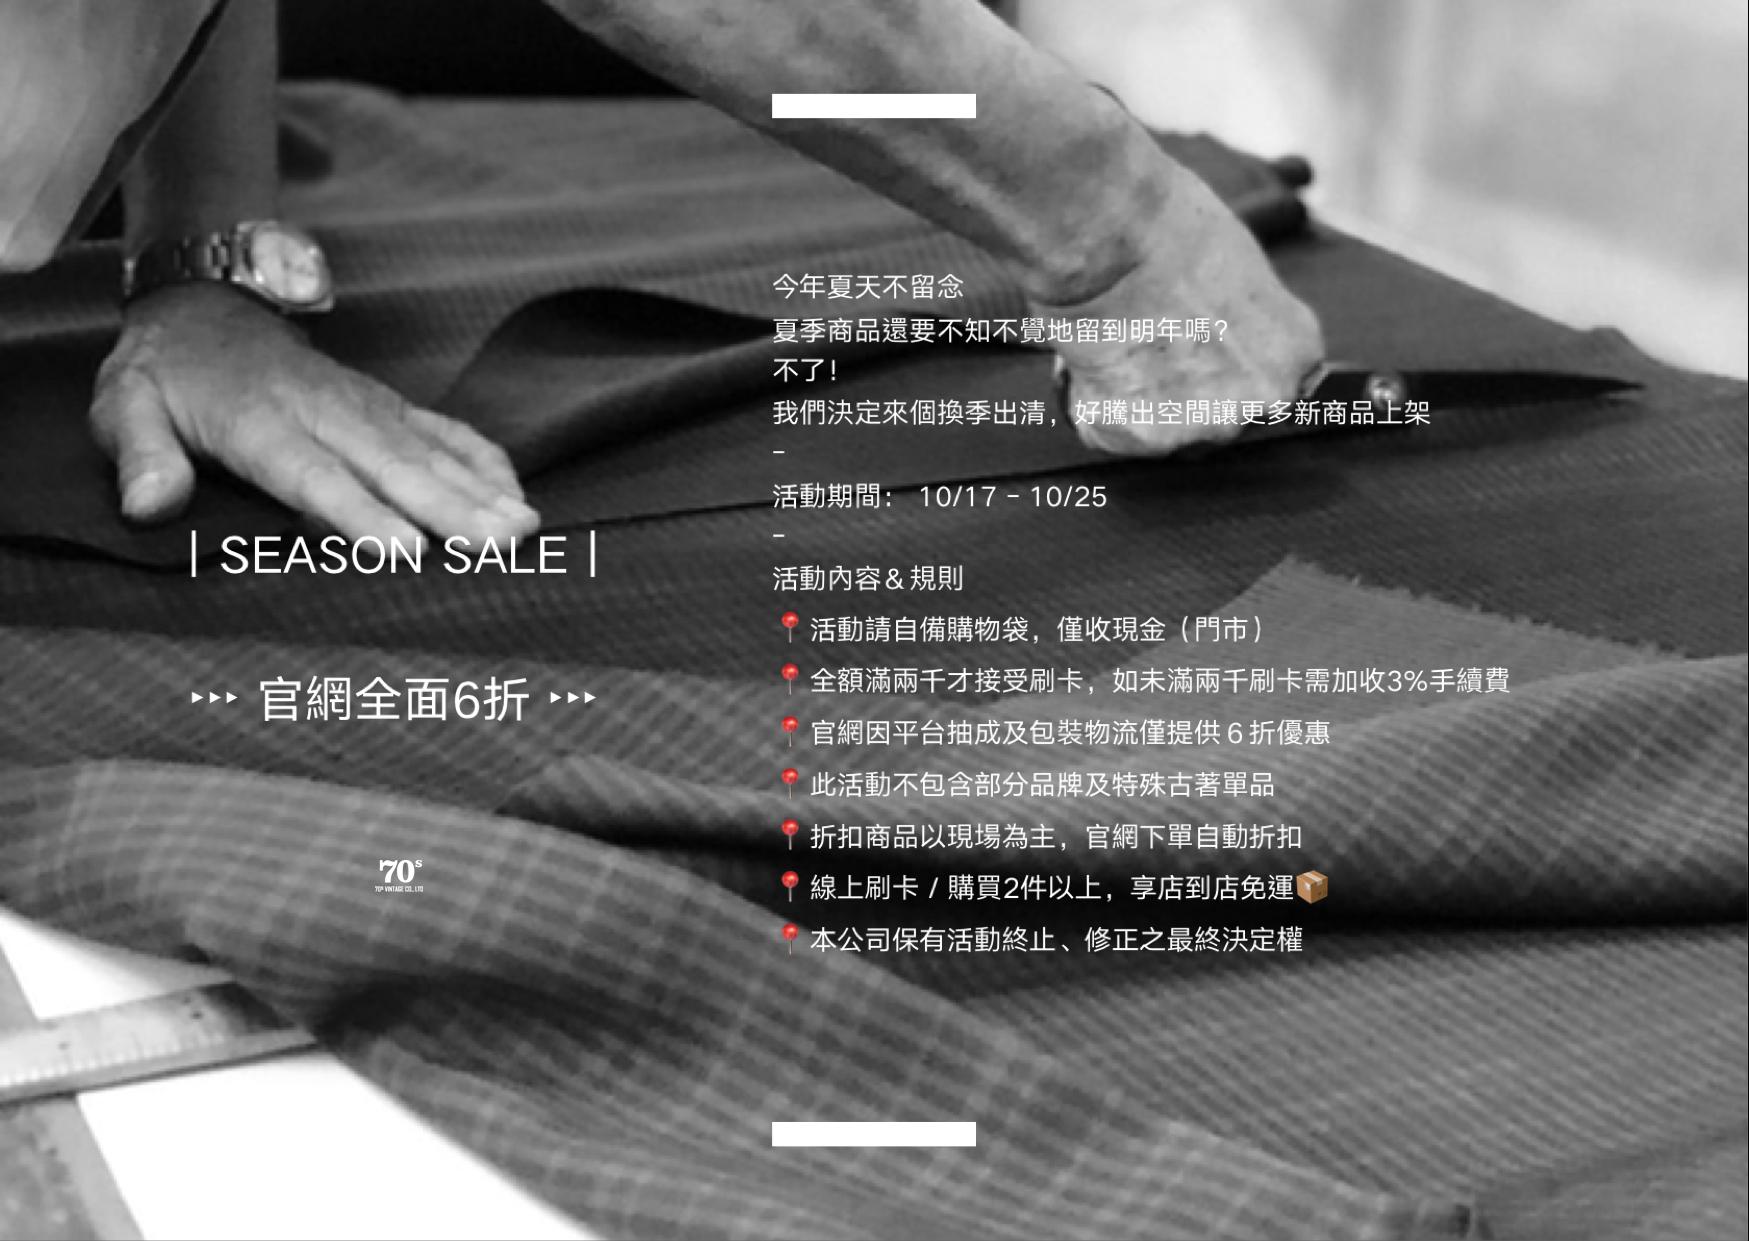 "<img src=""70s-vintage-clothing-換季折扣.jpeg"" alt=""70s-vintage-colthing-換季折扣"">"